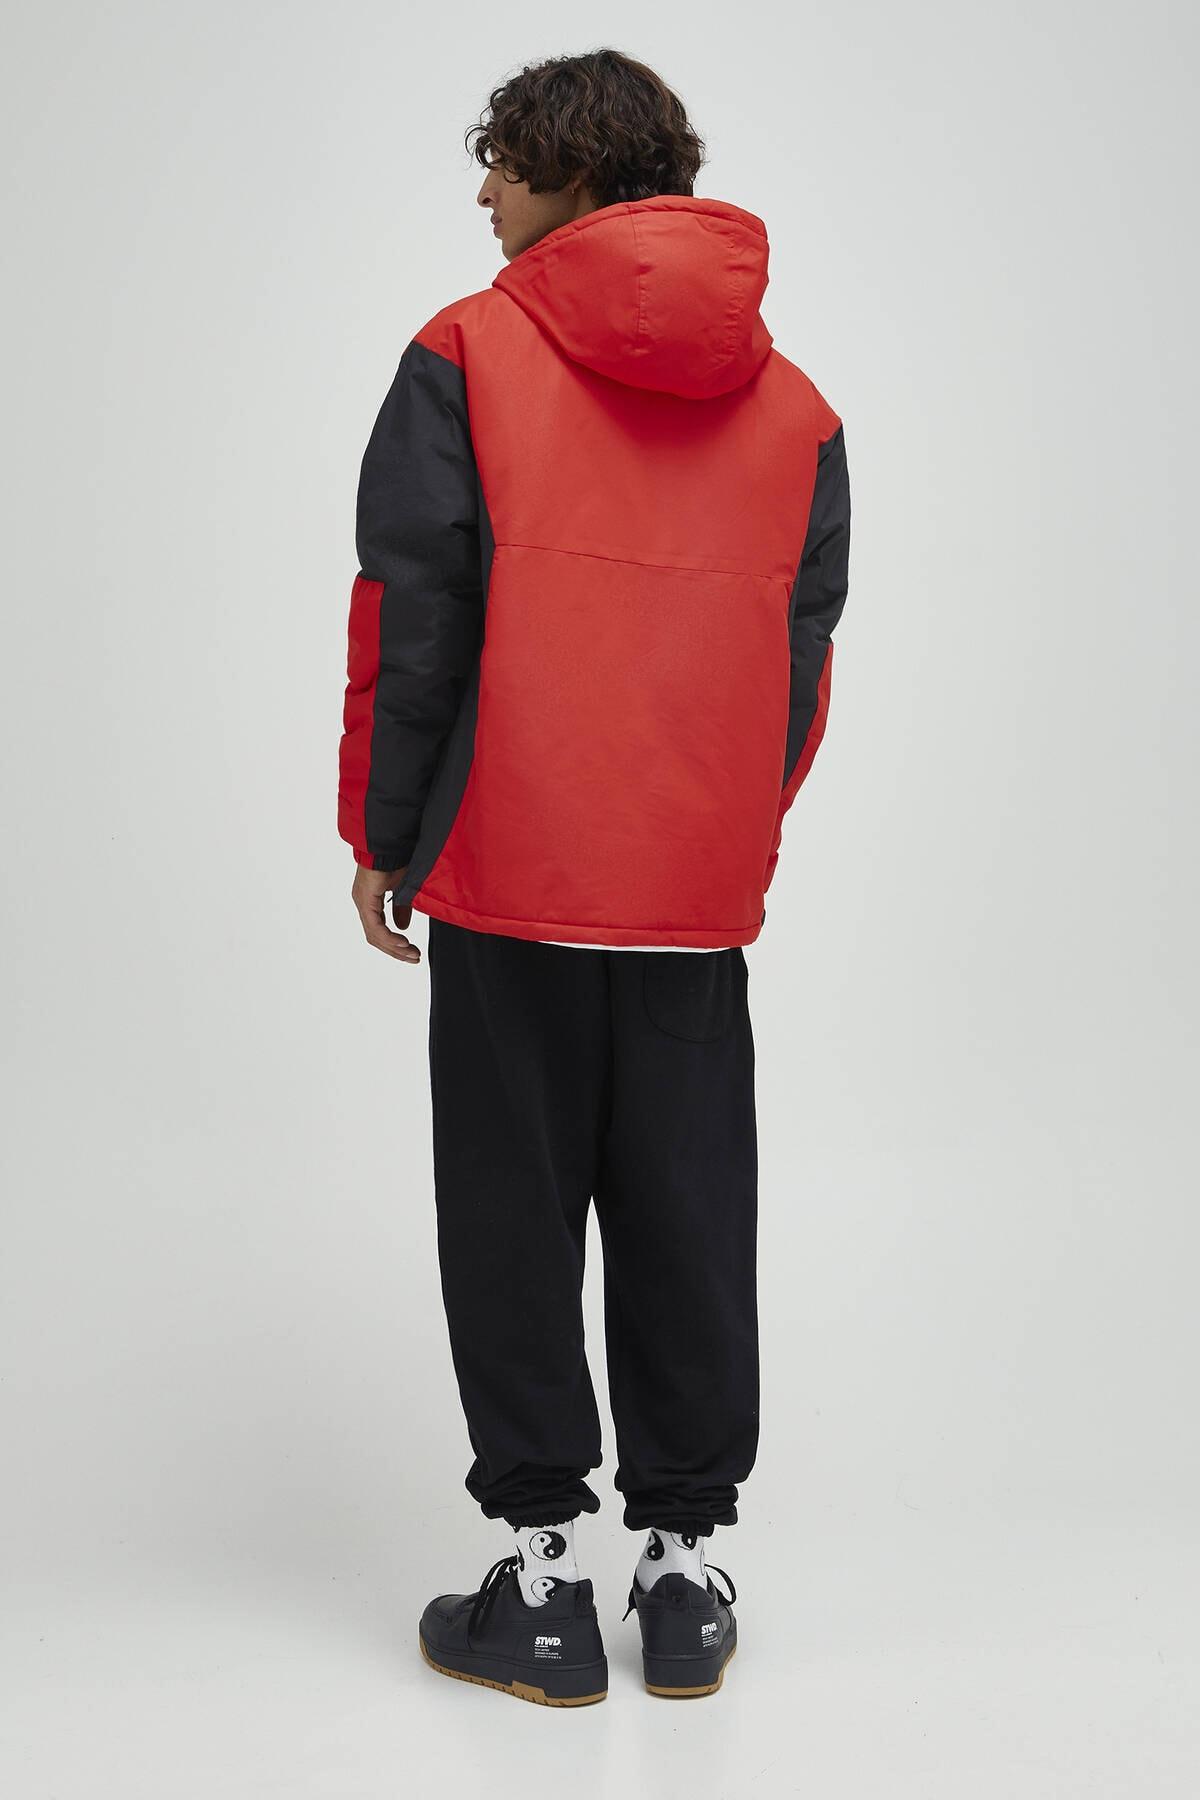 Pull & Bear Erkek Kırmızı Logolu Fermuarlı Kanguru Mont 09710526 3